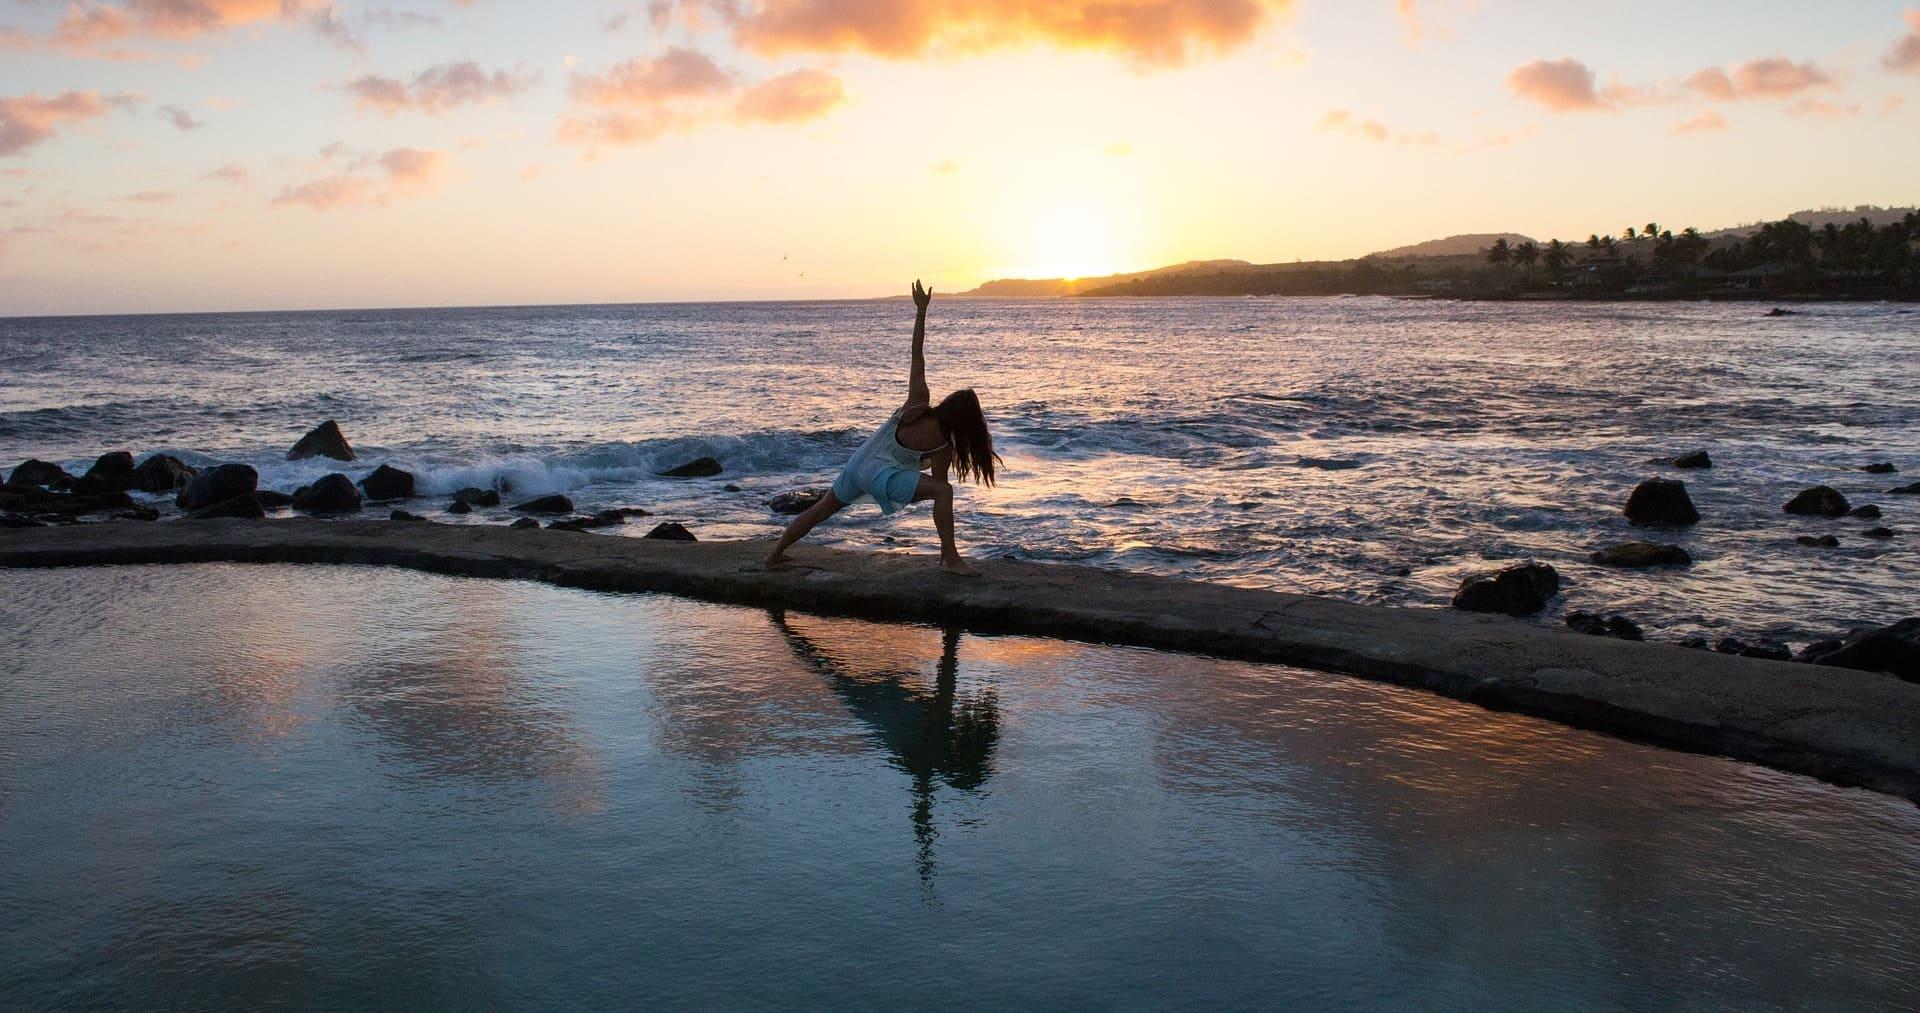 Изображение слайдера йога на берегу моря